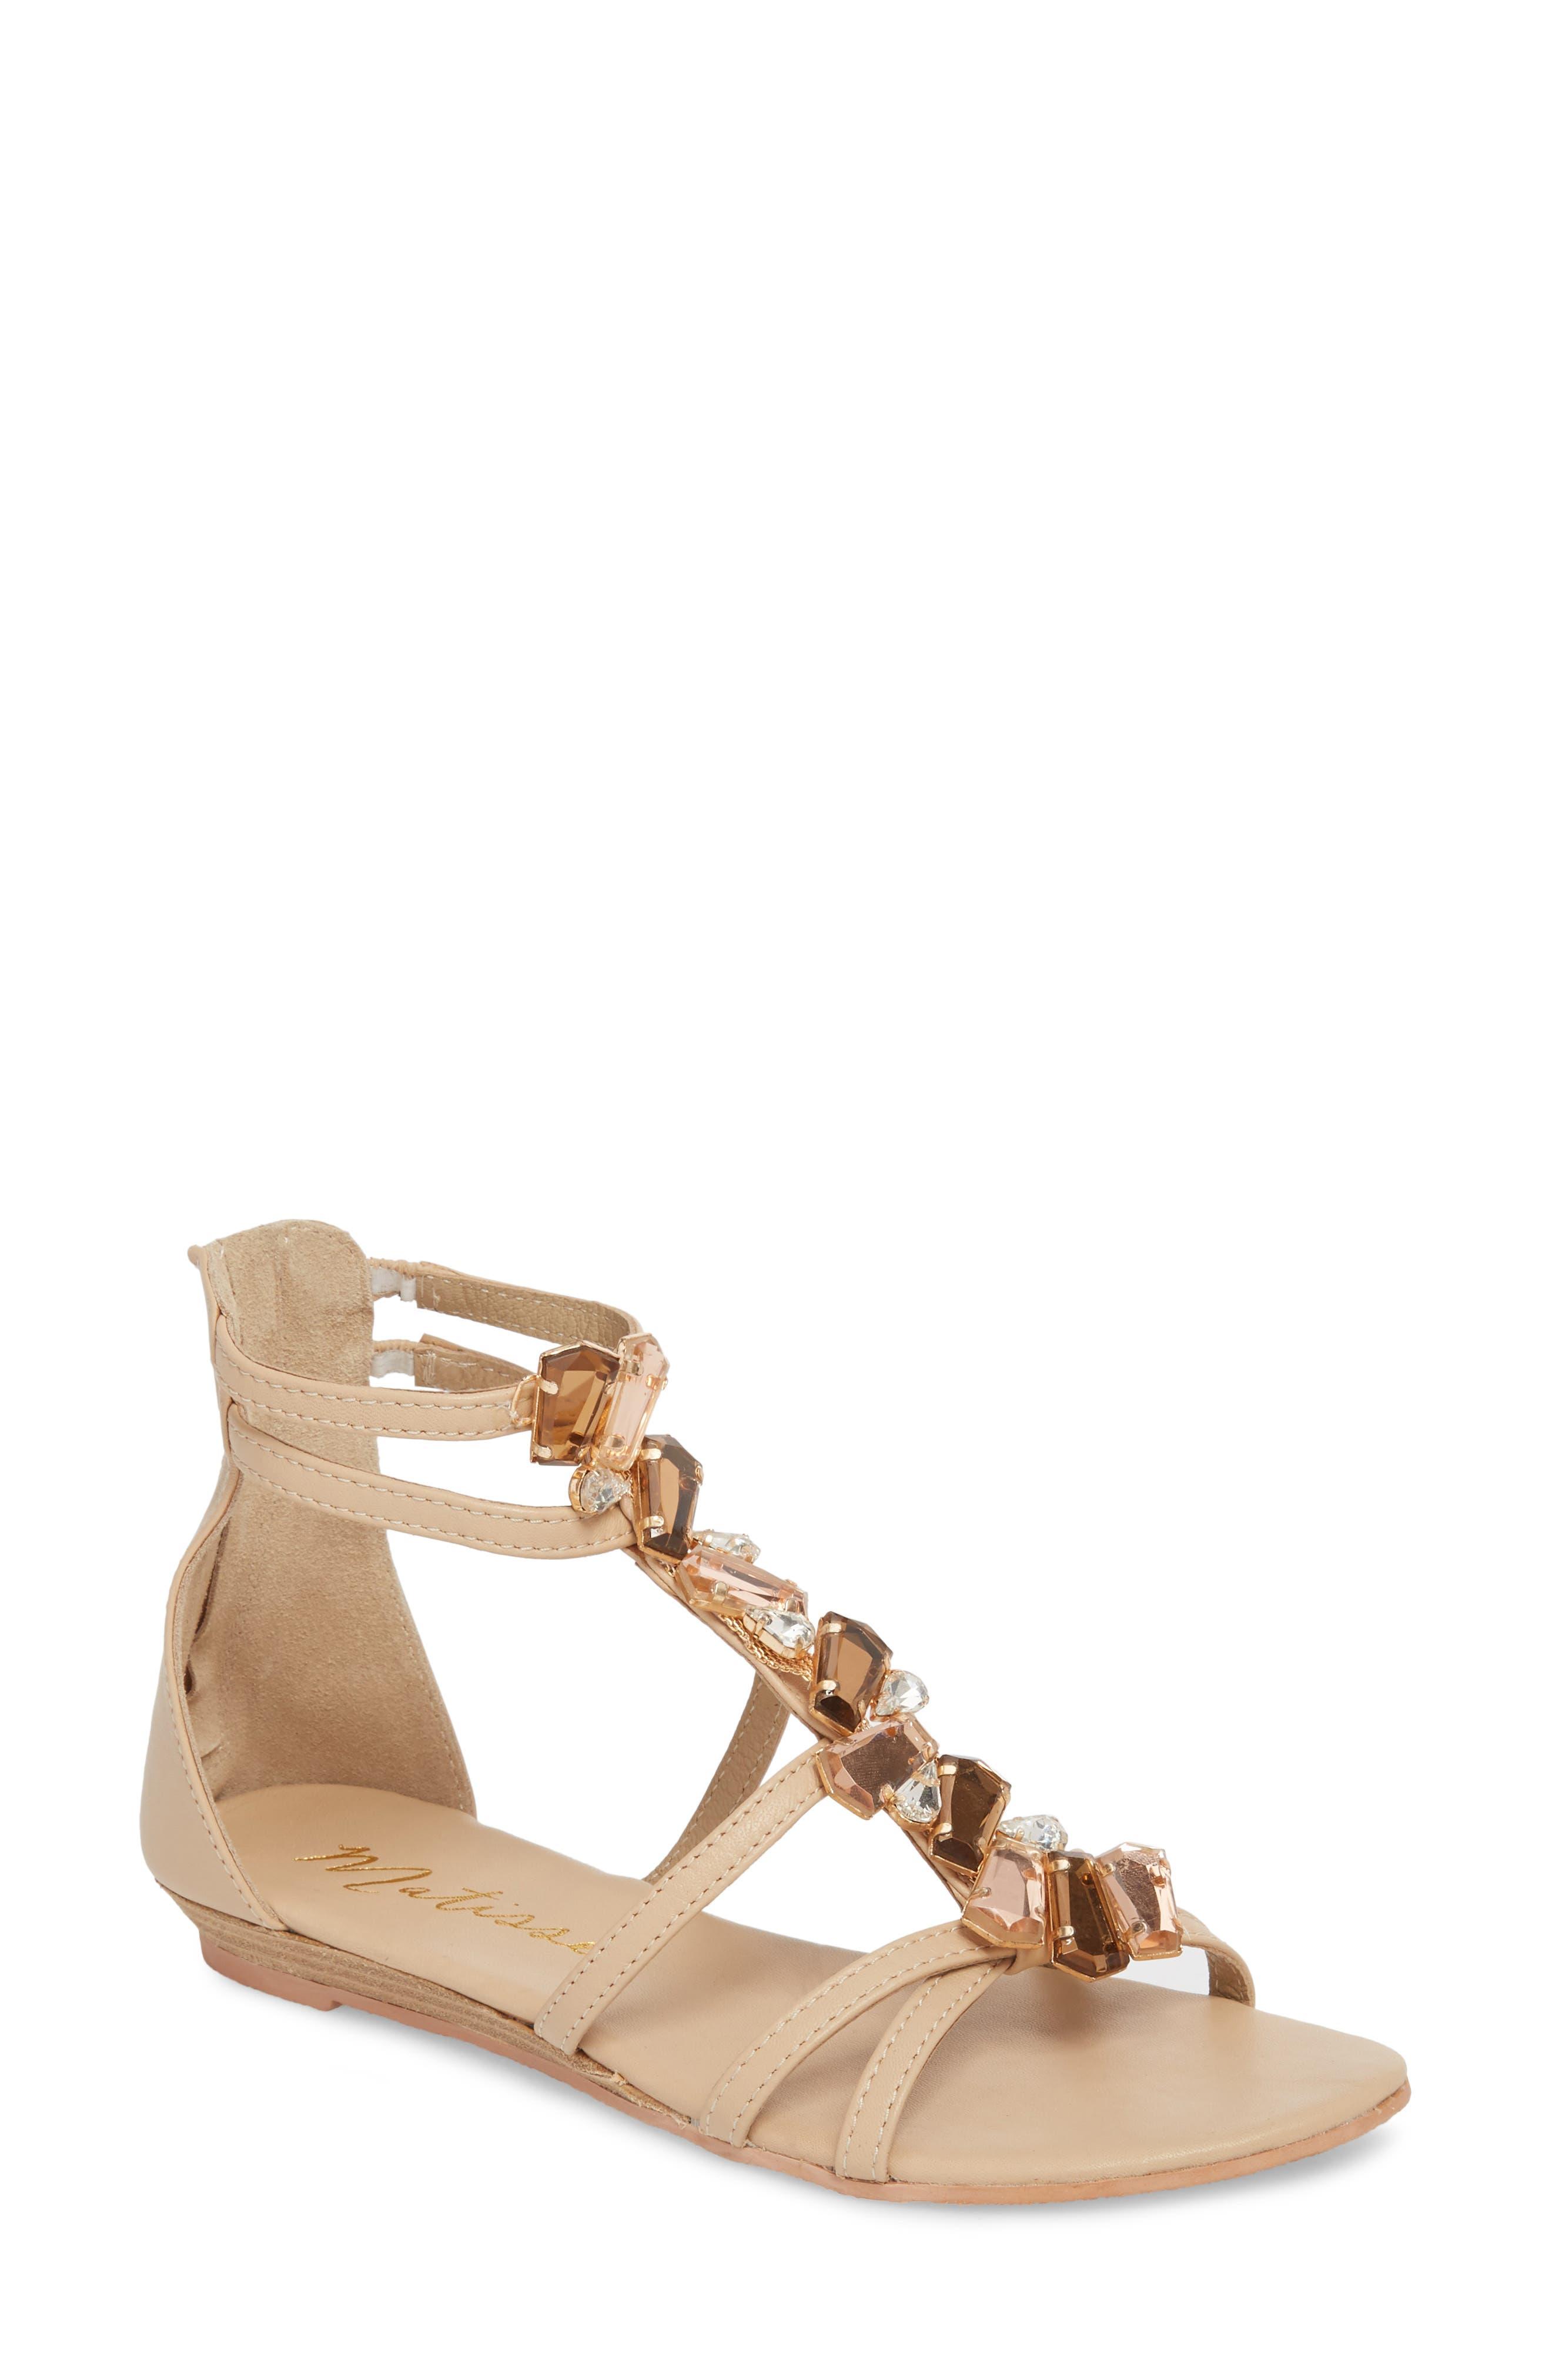 Didi Crystal Embellished Sandal,                             Main thumbnail 1, color,                             NATURAL LEATHER